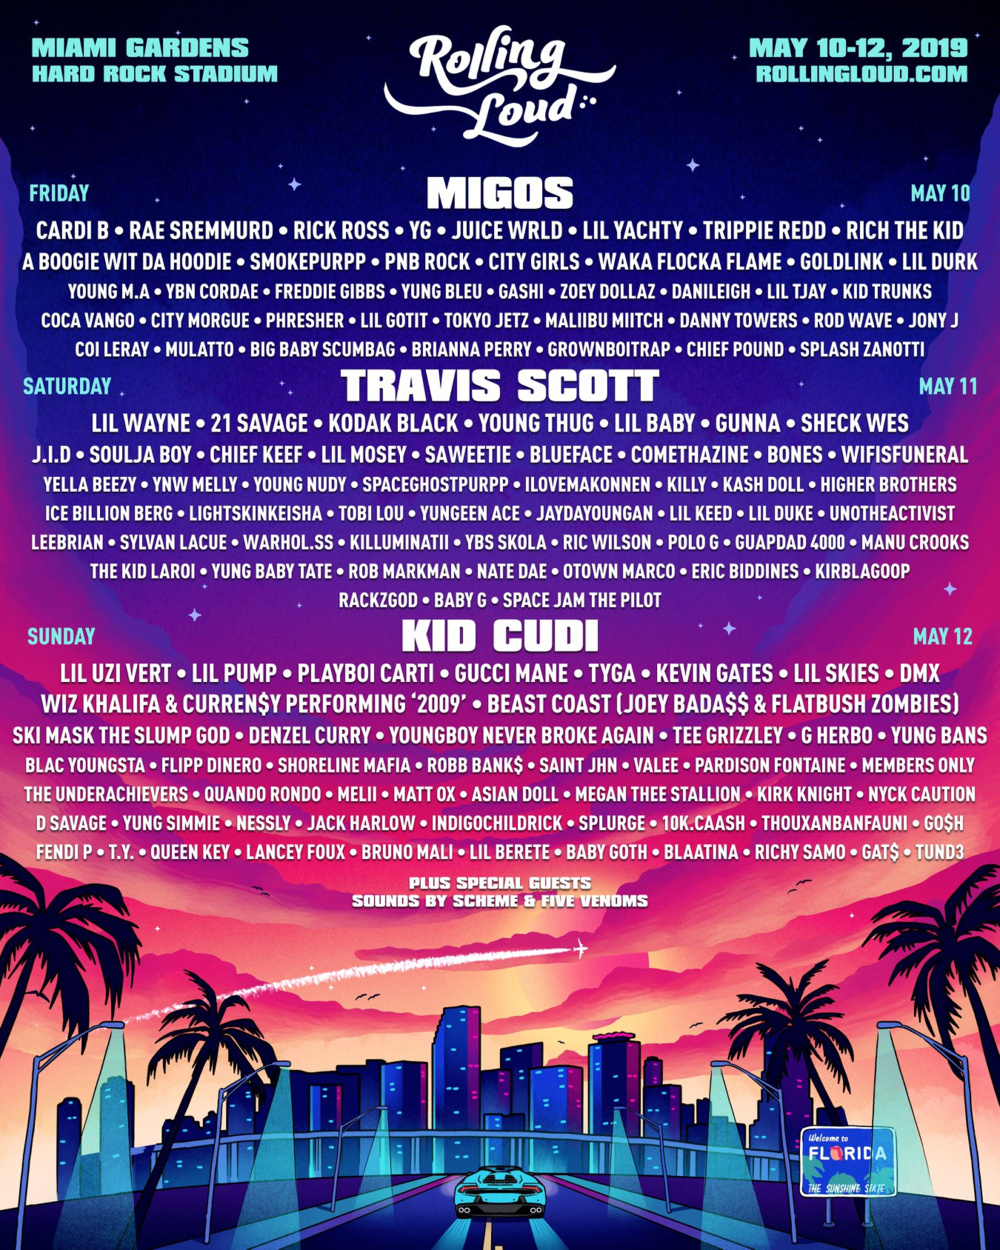 Rolling Loud Miami 2019 Lineup